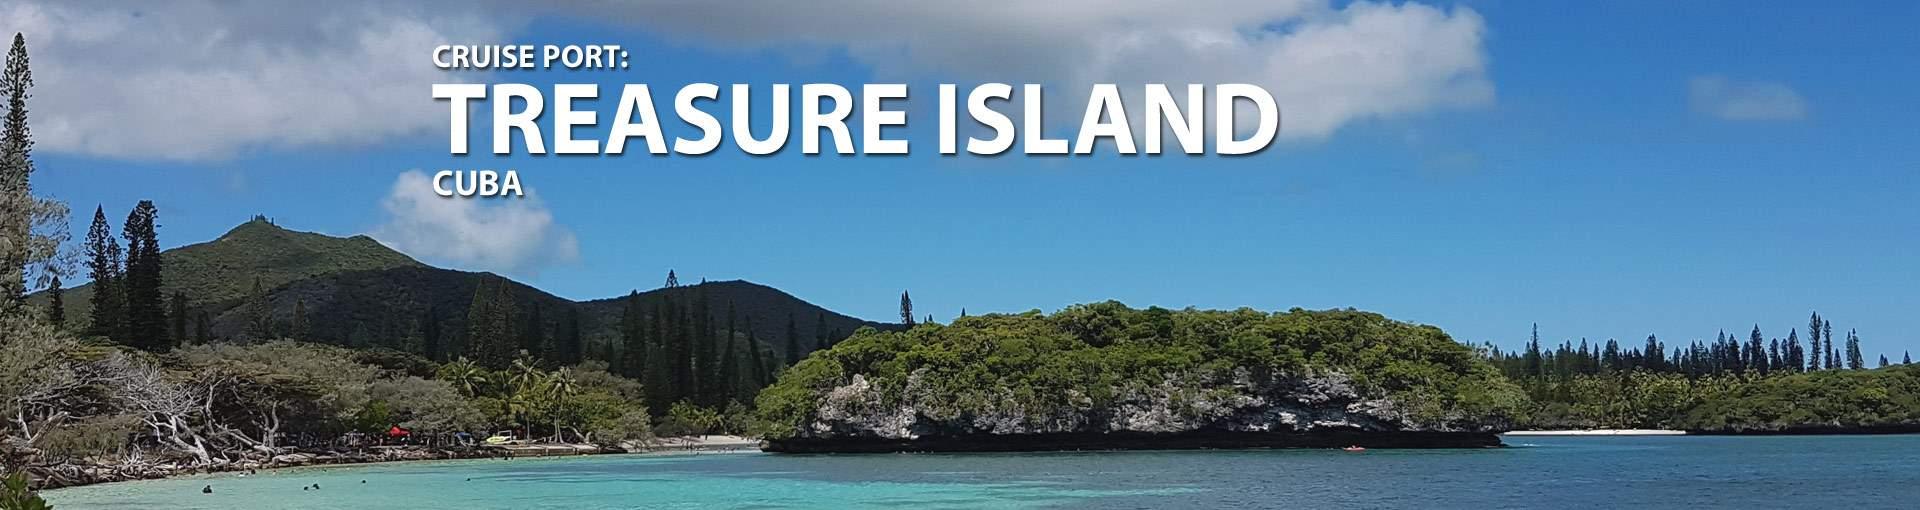 Treasure Island, Cuba Cruise Port